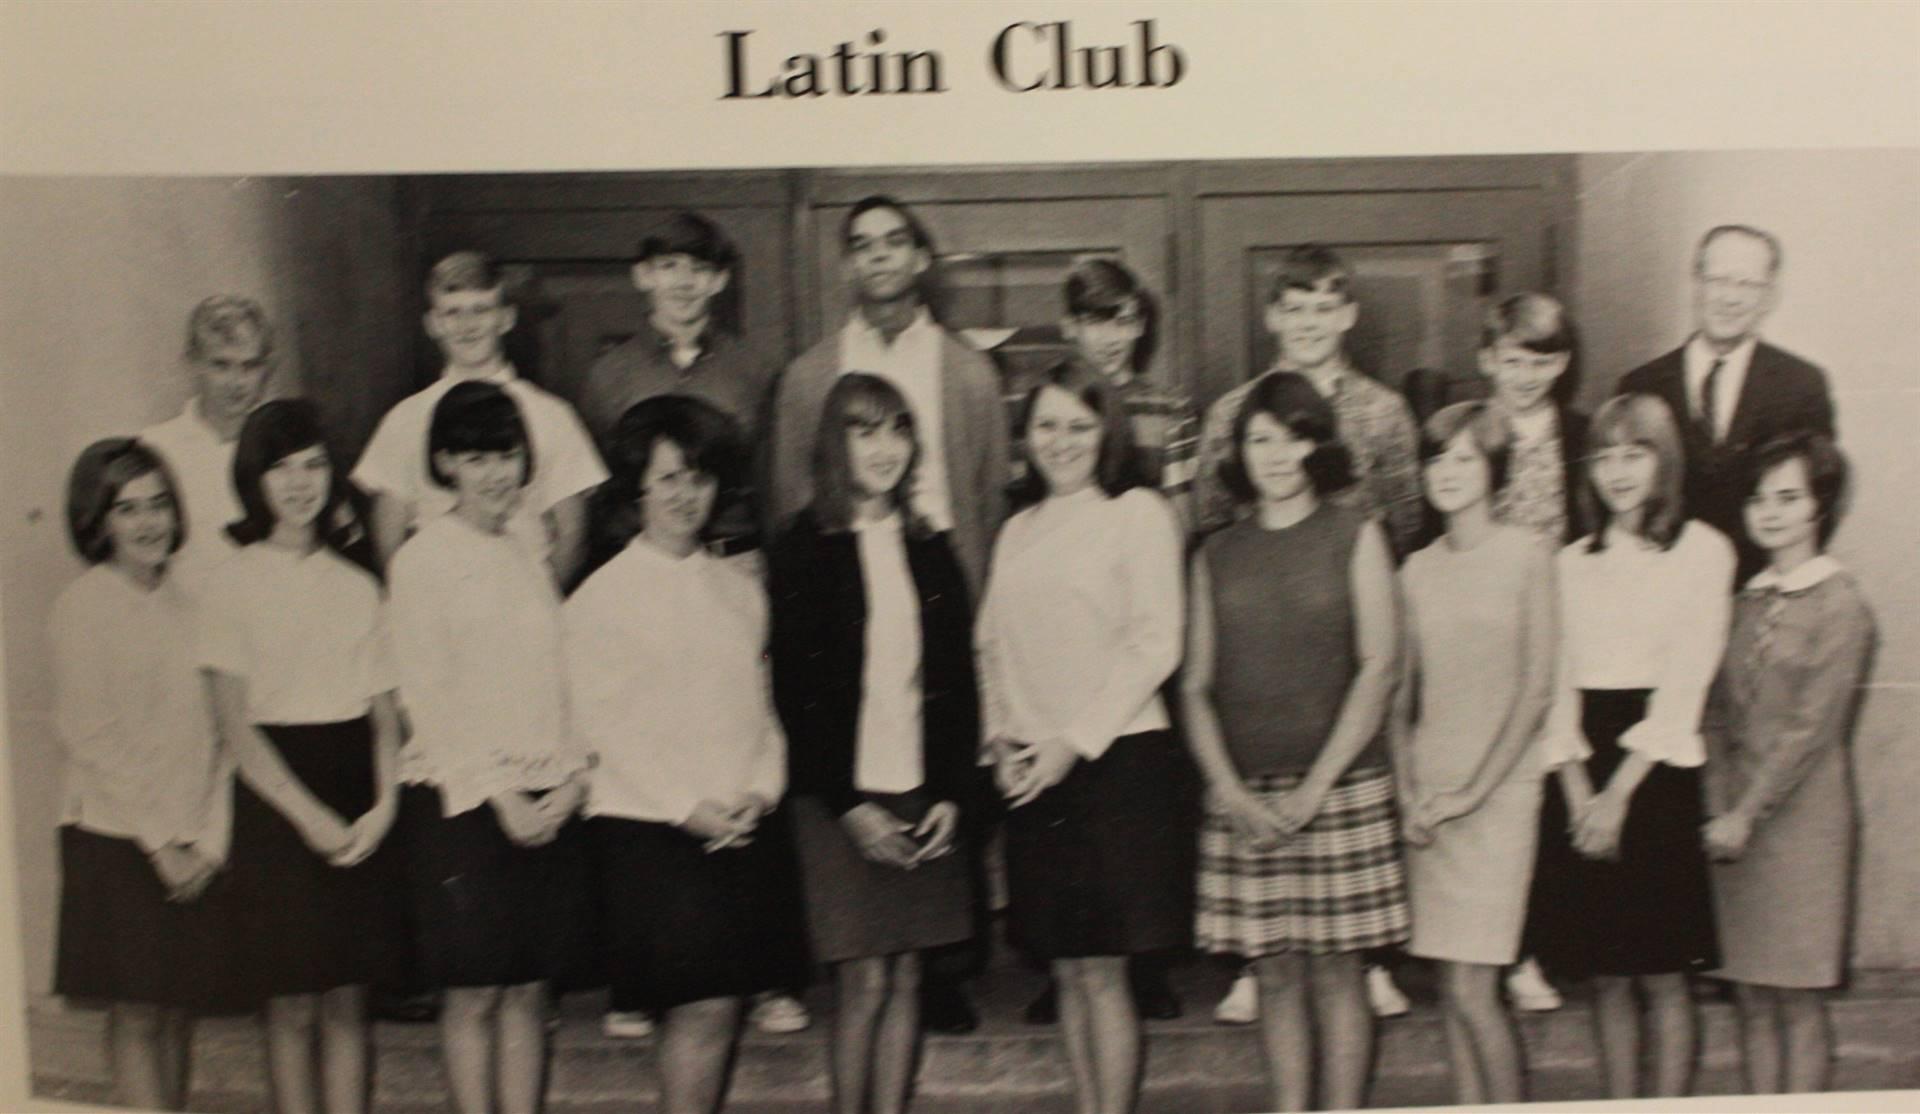 1968 Latin Club